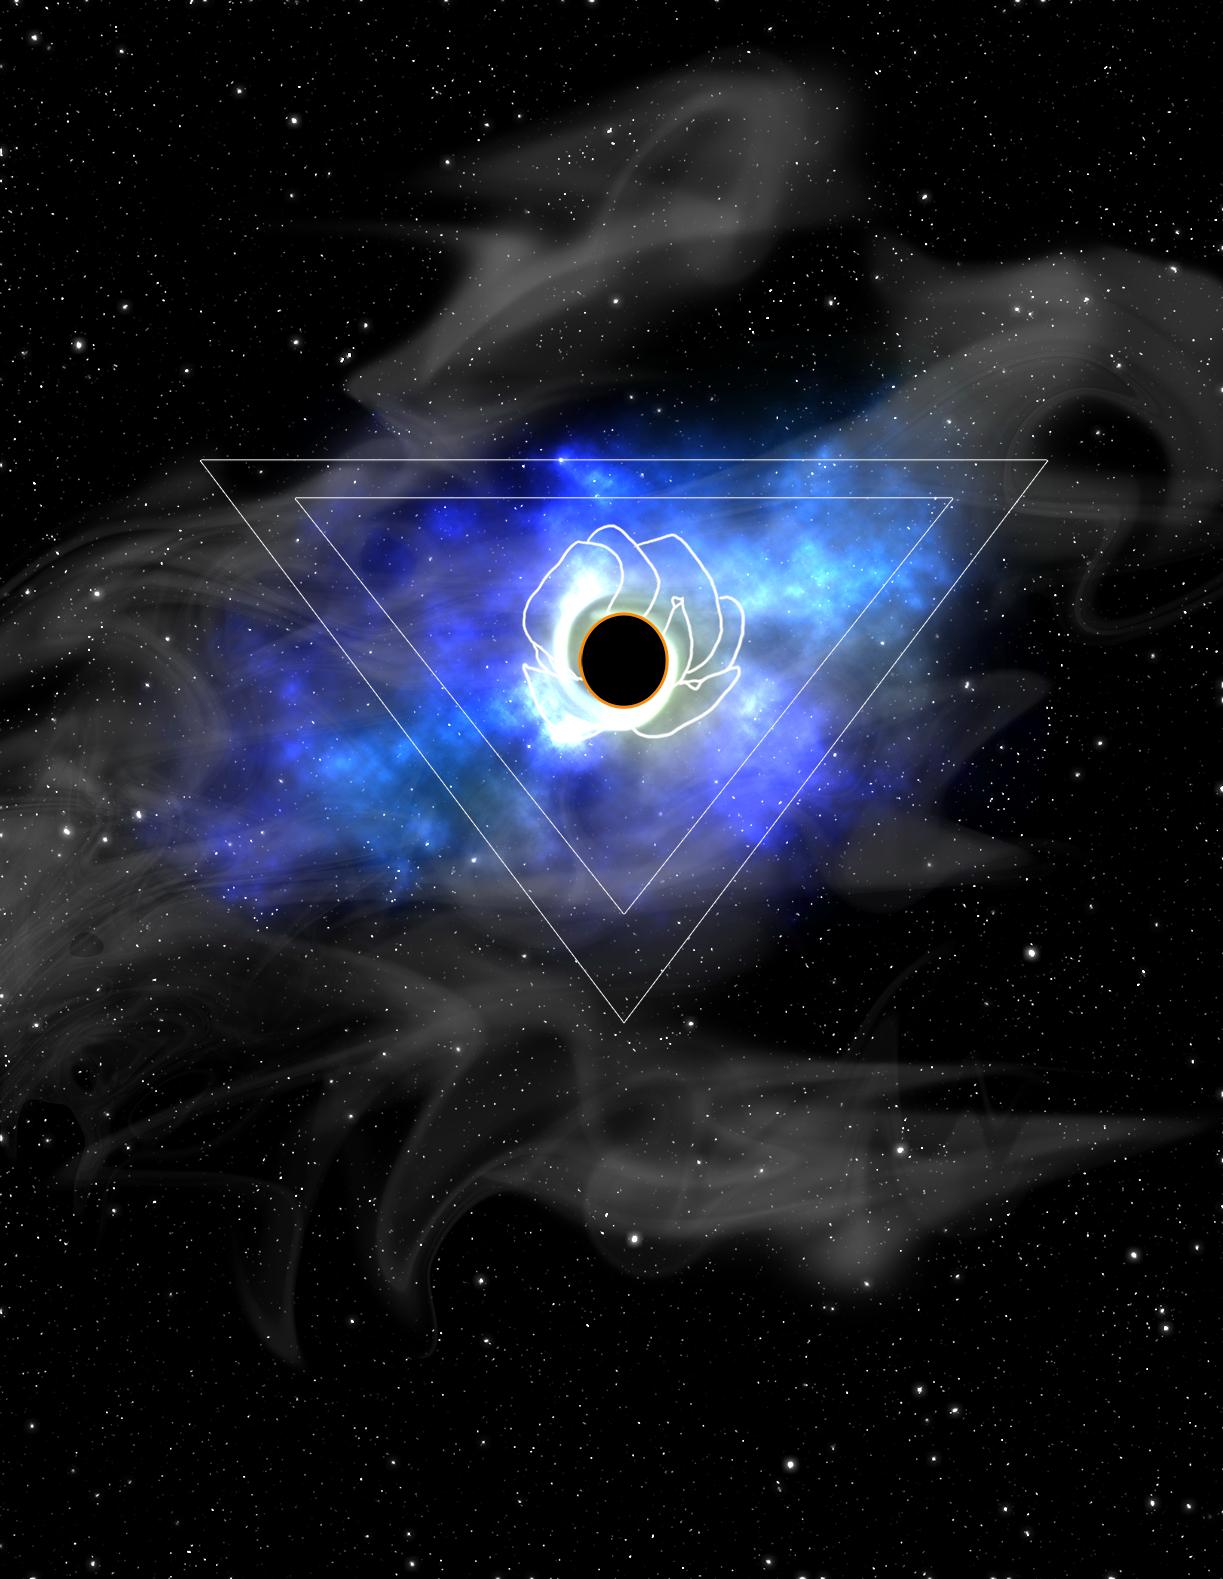 W_Blackhole_of_time